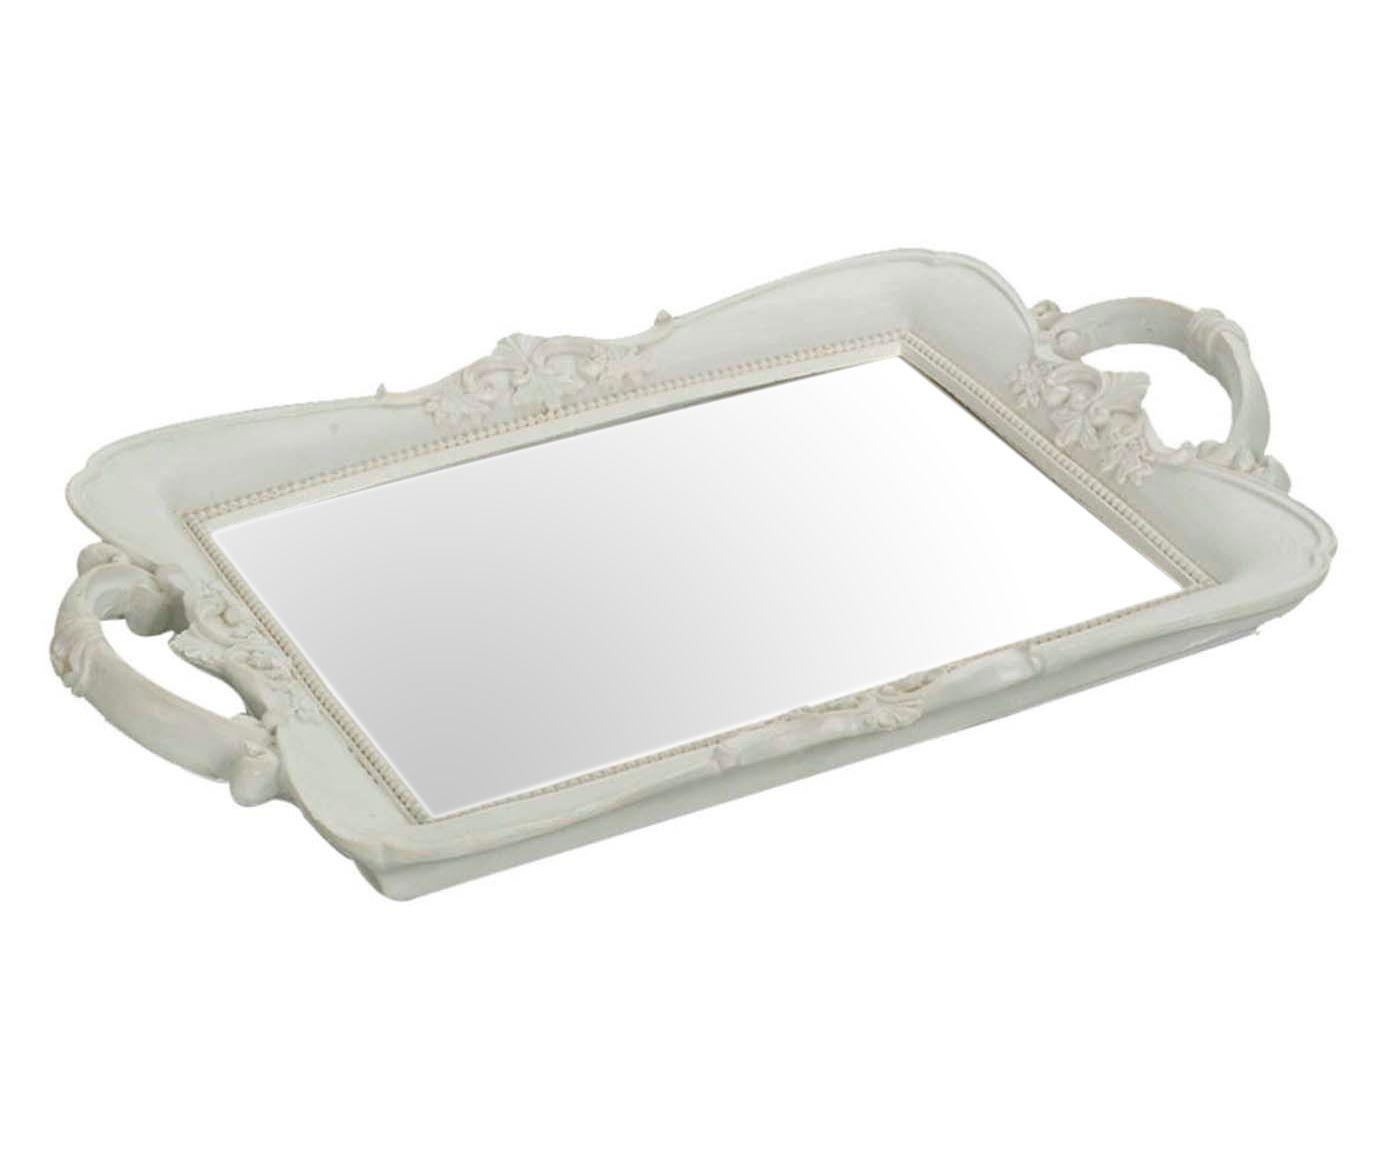 Bandeja mirror arabesc square | Westwing.com.br